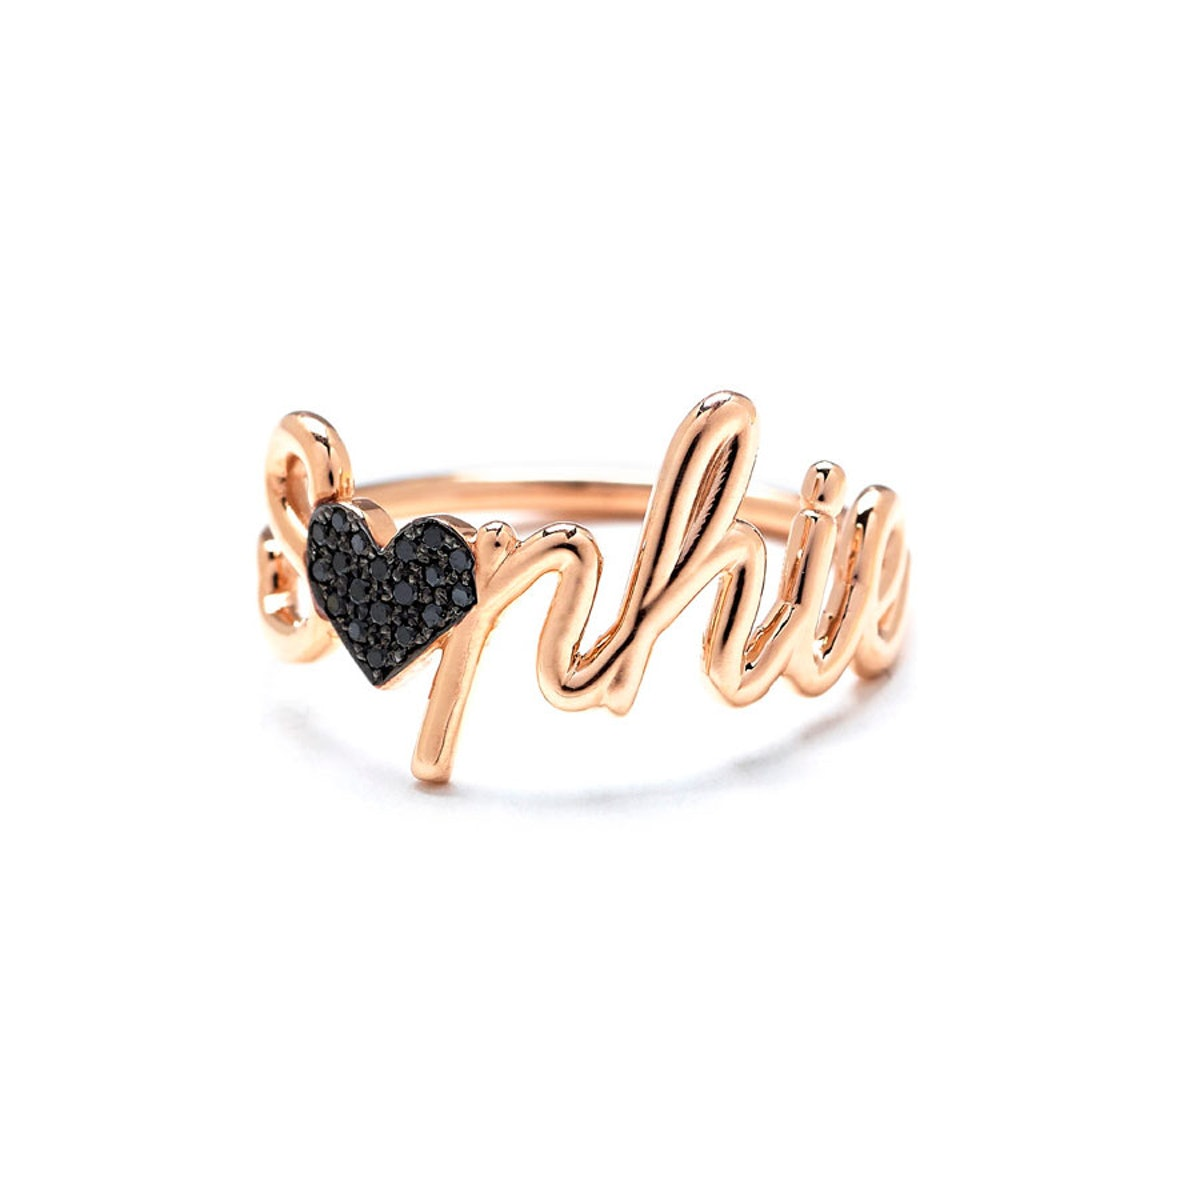 Thea by Emilie Duchene 18k gold custom ring